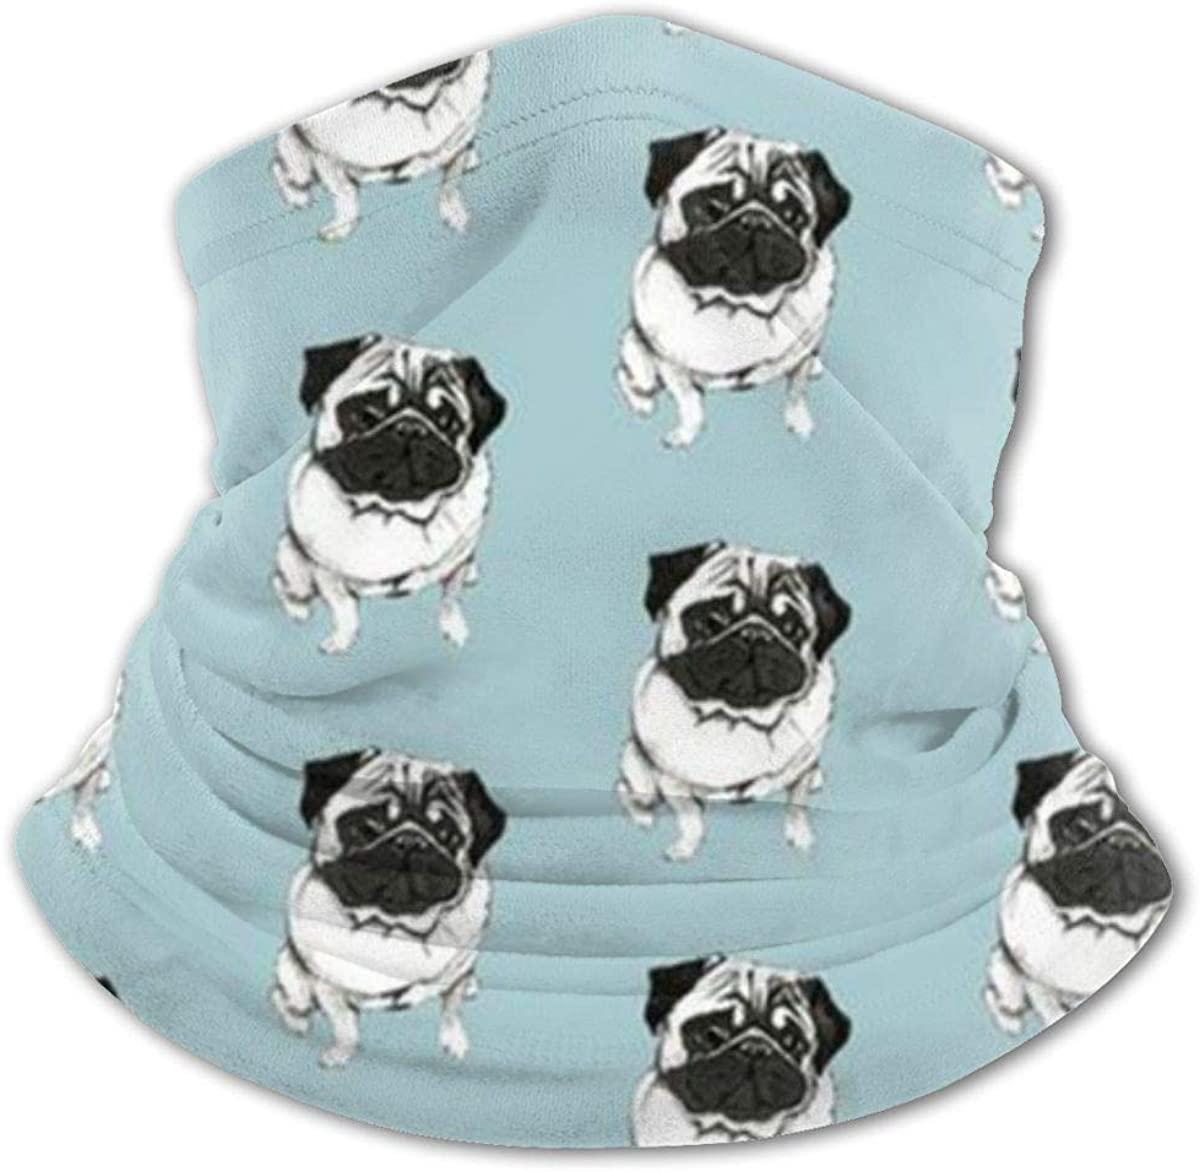 French Puppy Headwear For Girls And Boys, Head Wrap, Neck Gaiter, Headband, Tenn Fishing Mask, Magic Scarf, Tube Mask, Face Bandana Mask For Camping Running Cycling